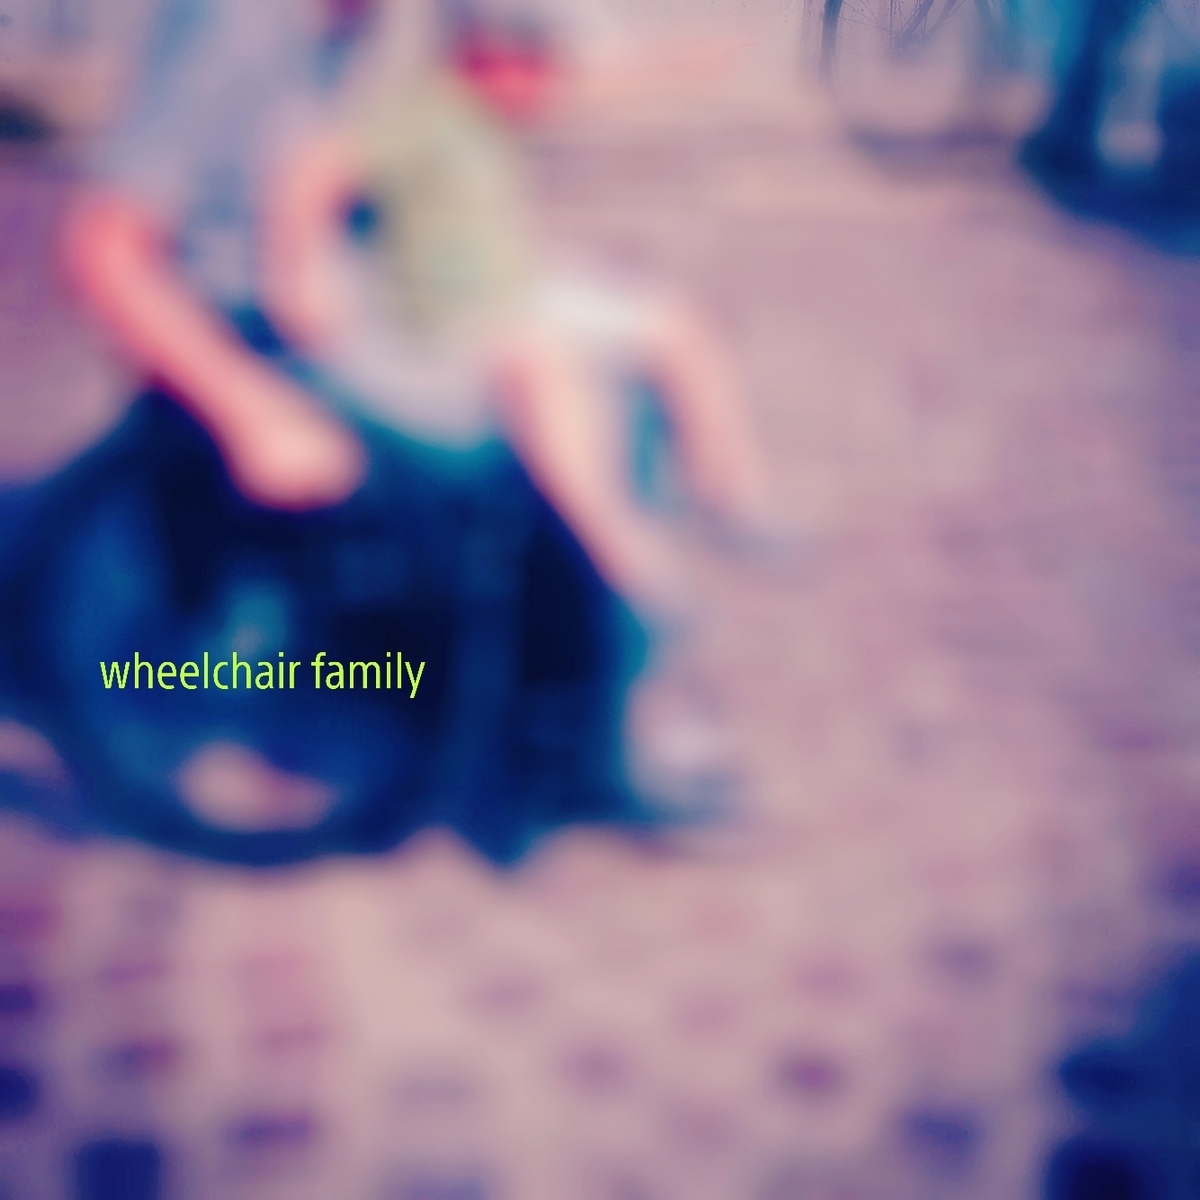 f:id:WheelchairFamily:20190529113846j:plain